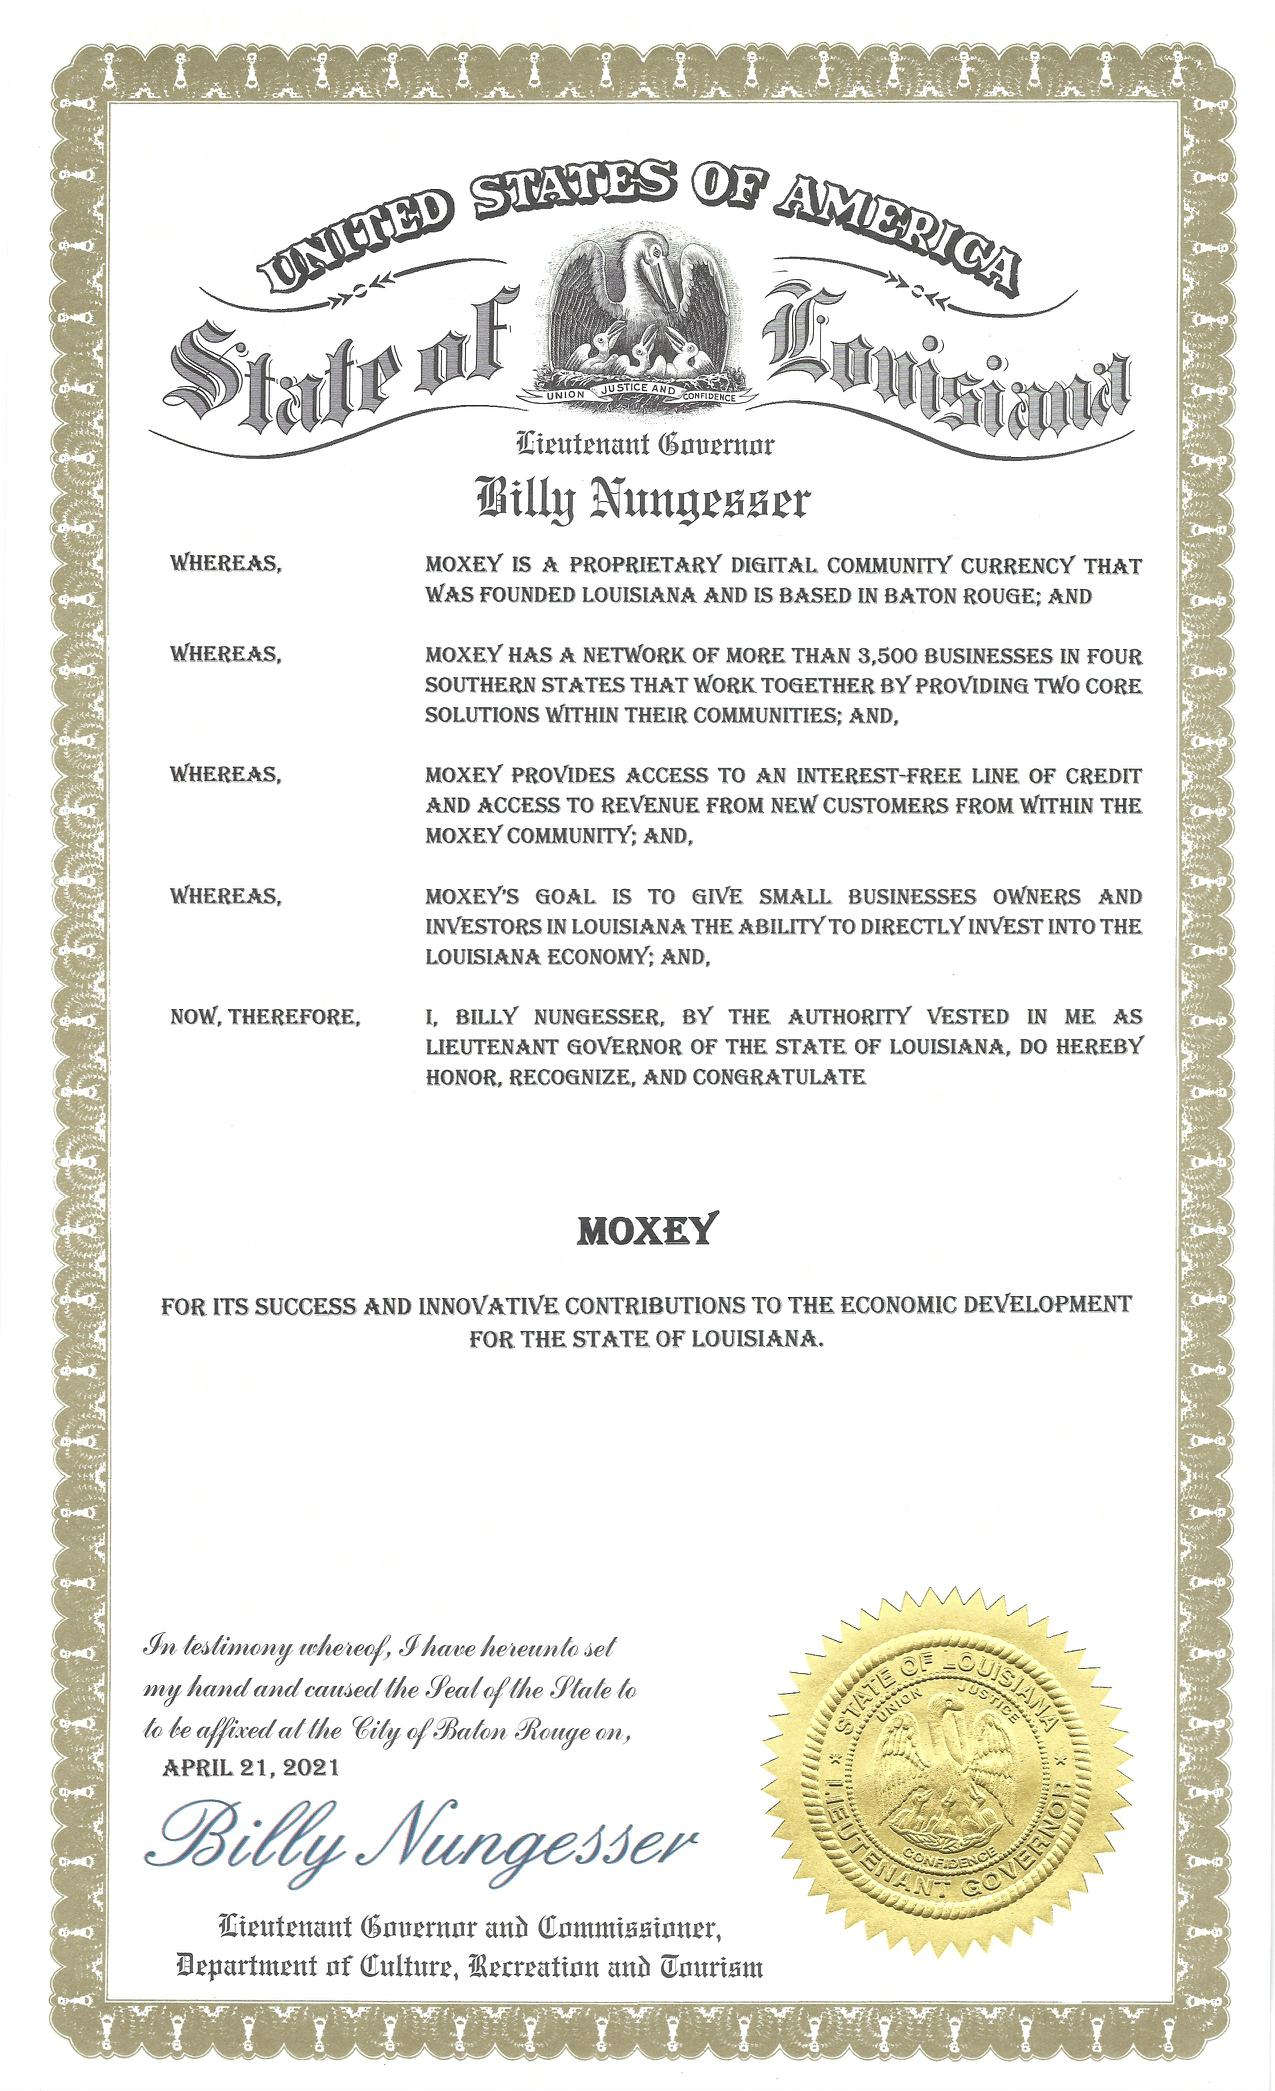 LA Lt. Governor Proclamation - Moxey